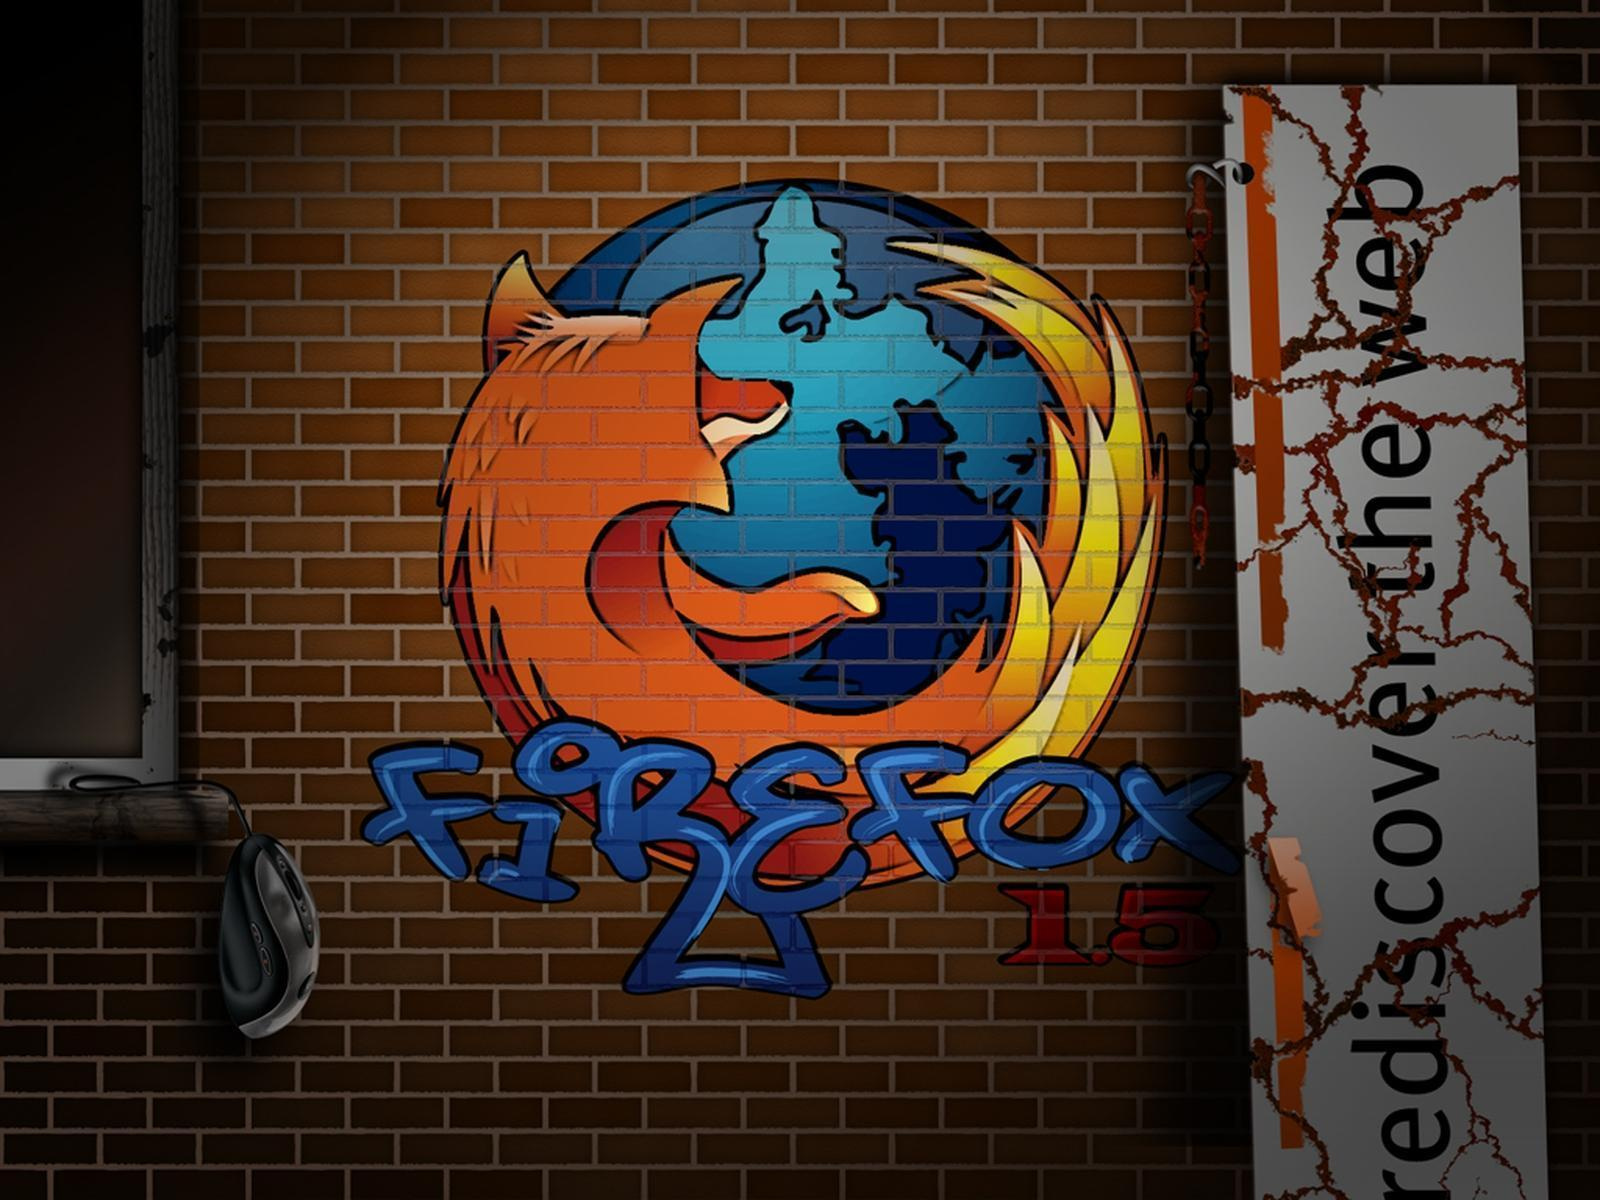 graffiti wallpapers desktop 3d wallpaper cave